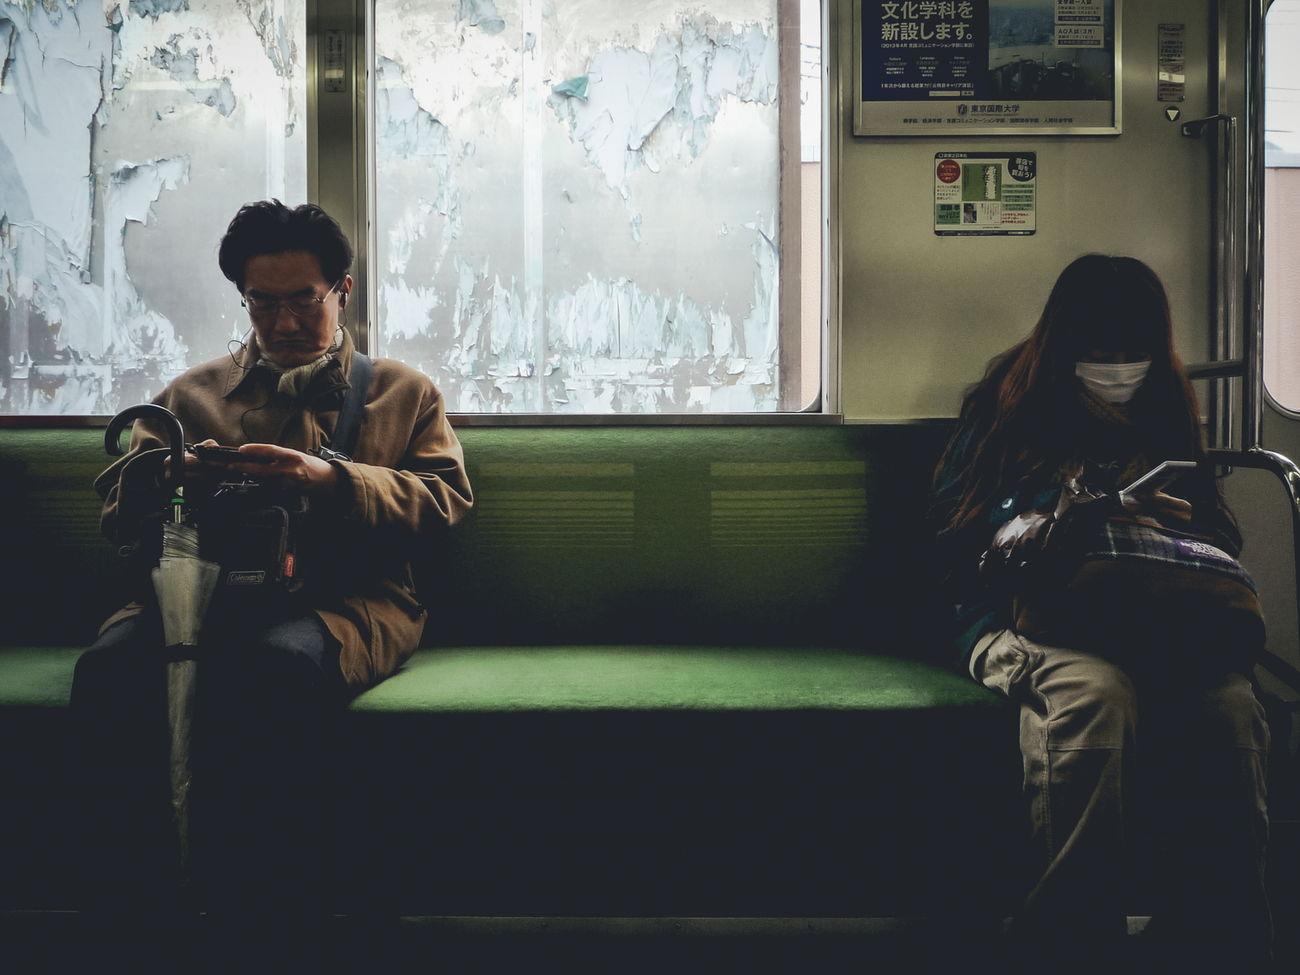 Streetphotography People Tokyo Street Photography Streetphoto Japan The Week Of Eyeem Life Two People